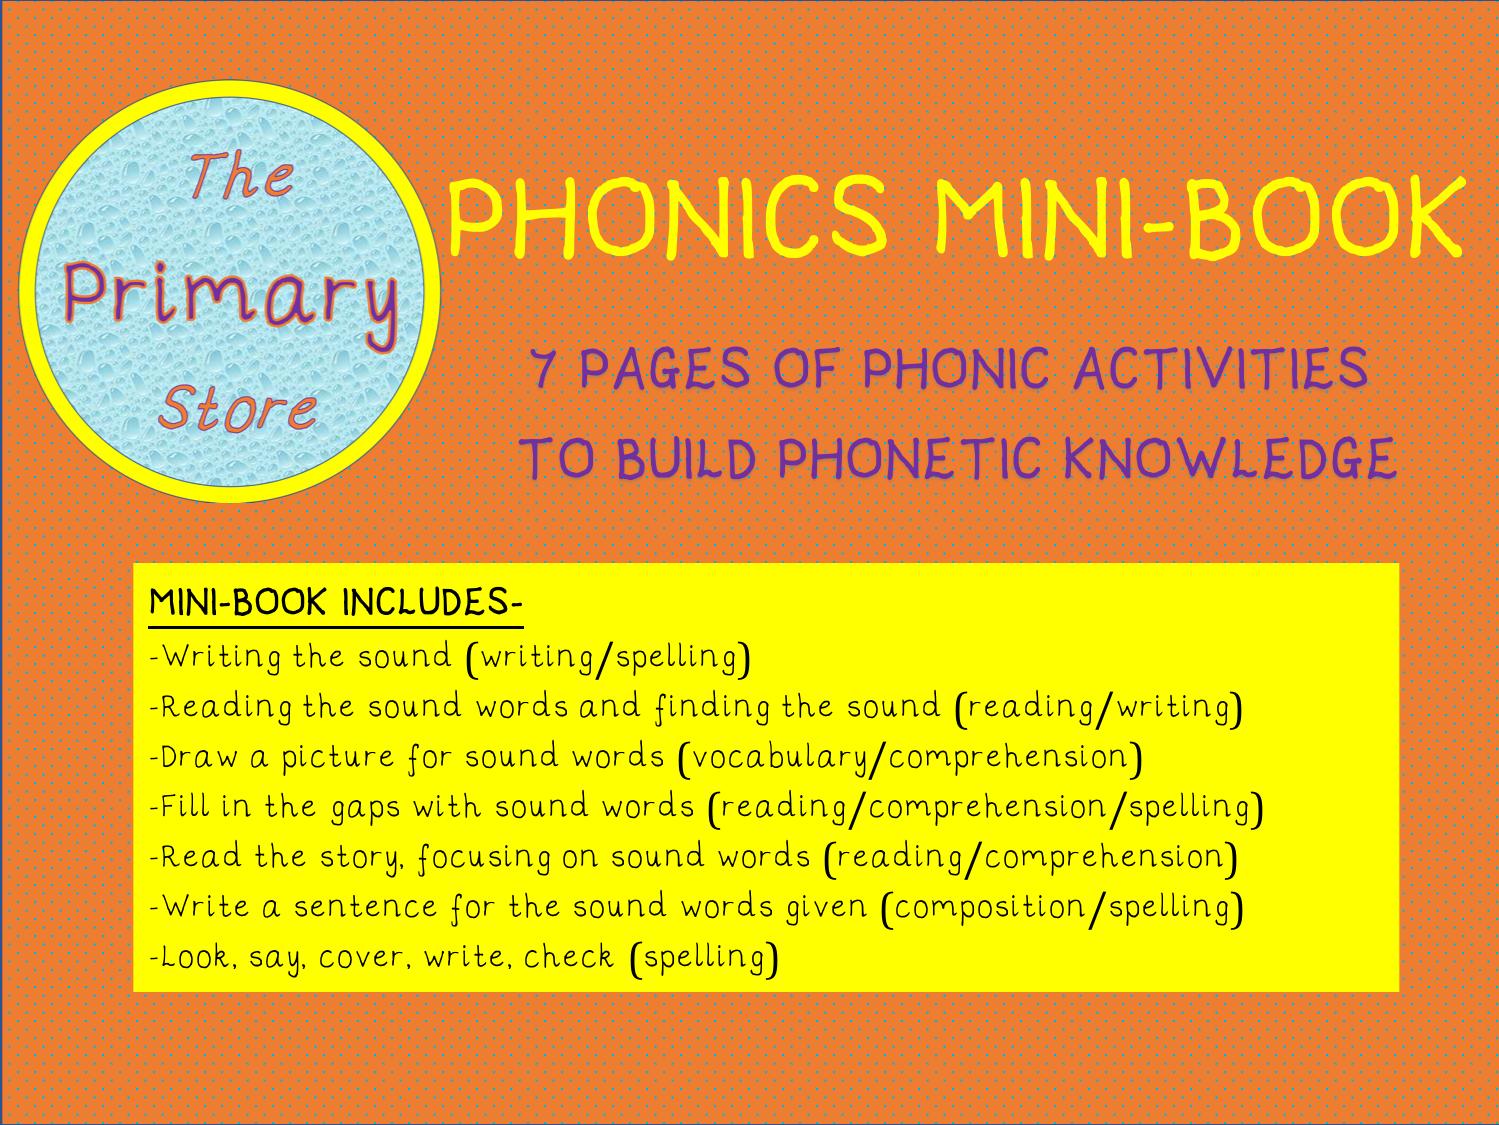 PHONIC MINI-BOOK BUNDLE: AY, EE, IGH, OW, OO, OO, AR, OR, AIR, IR, OU, OY